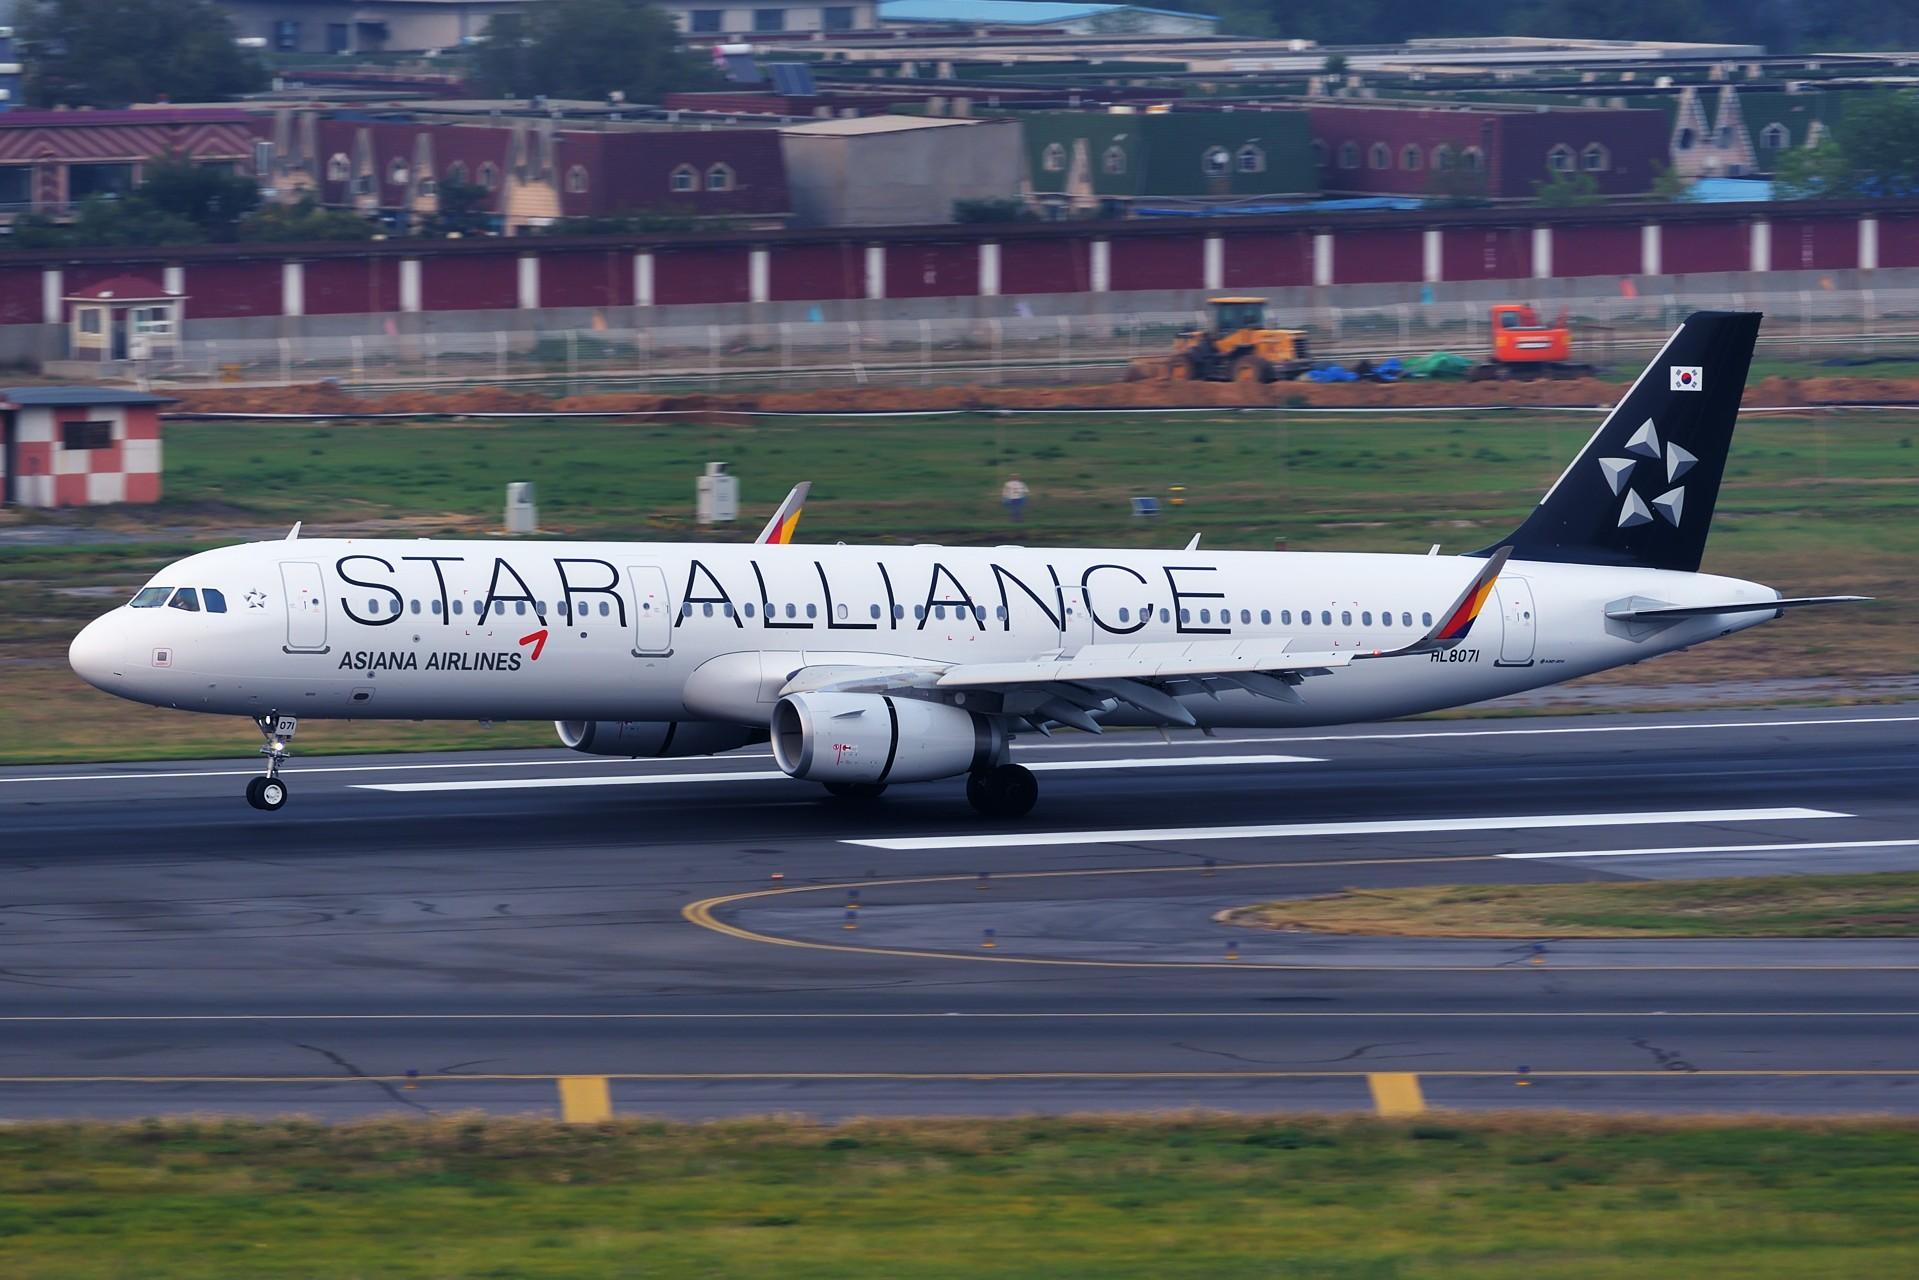 Re:[原创]★[DLC]2016年终总结(持续更新中)★ AIRBUS A321-200 HL8071 中国大连国际机场